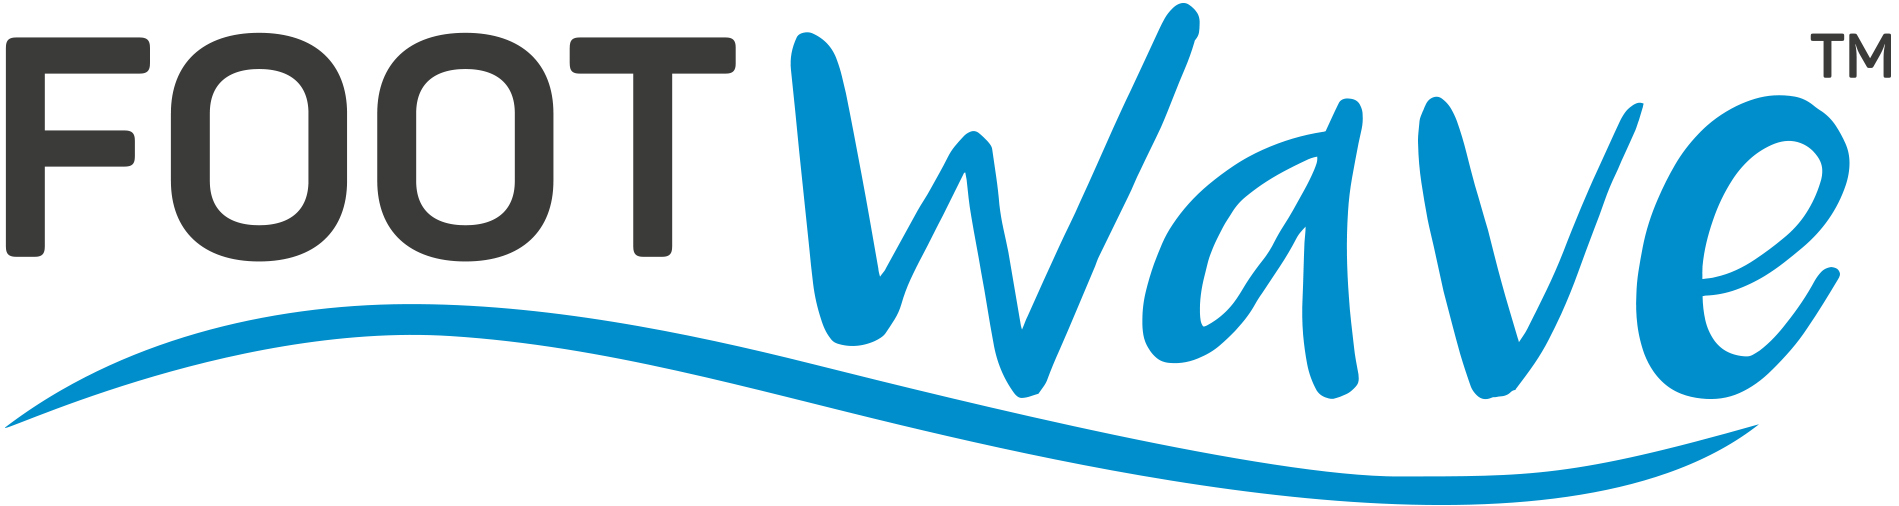 footwave_logo